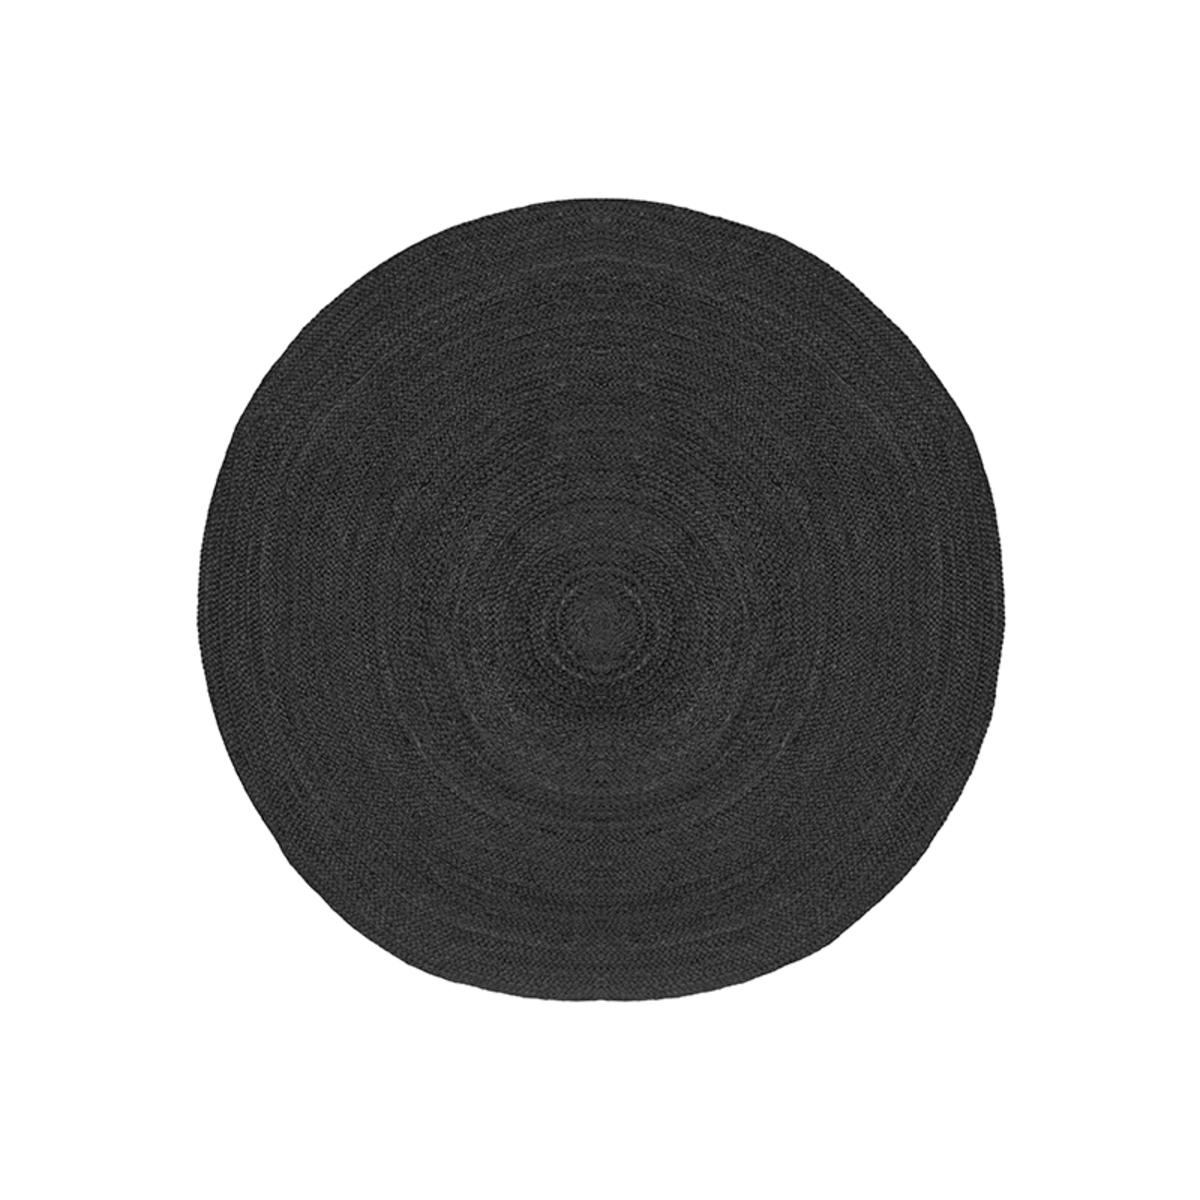 Vloerkleed Jute - Zwart - Jute - 120 cm